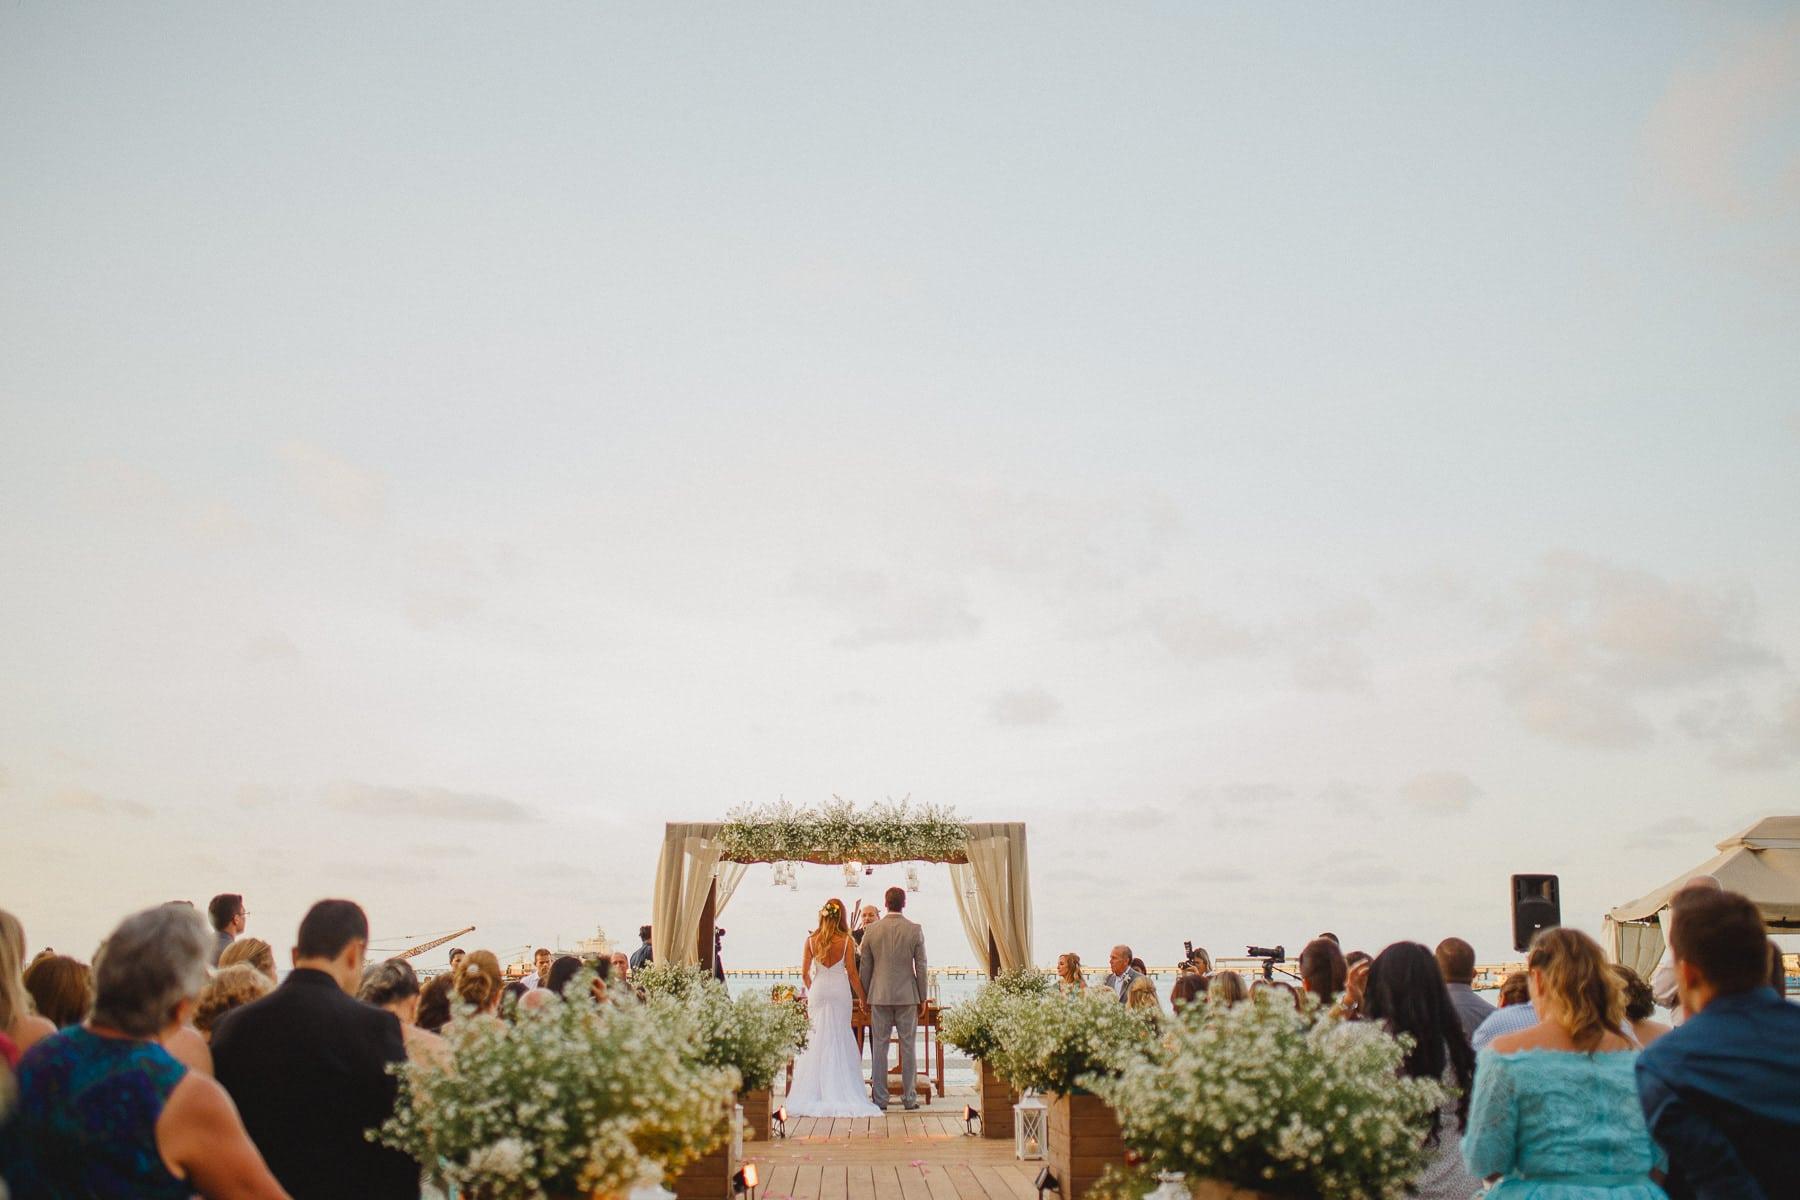 Lugares inusitados para casamento – Conheça alguns